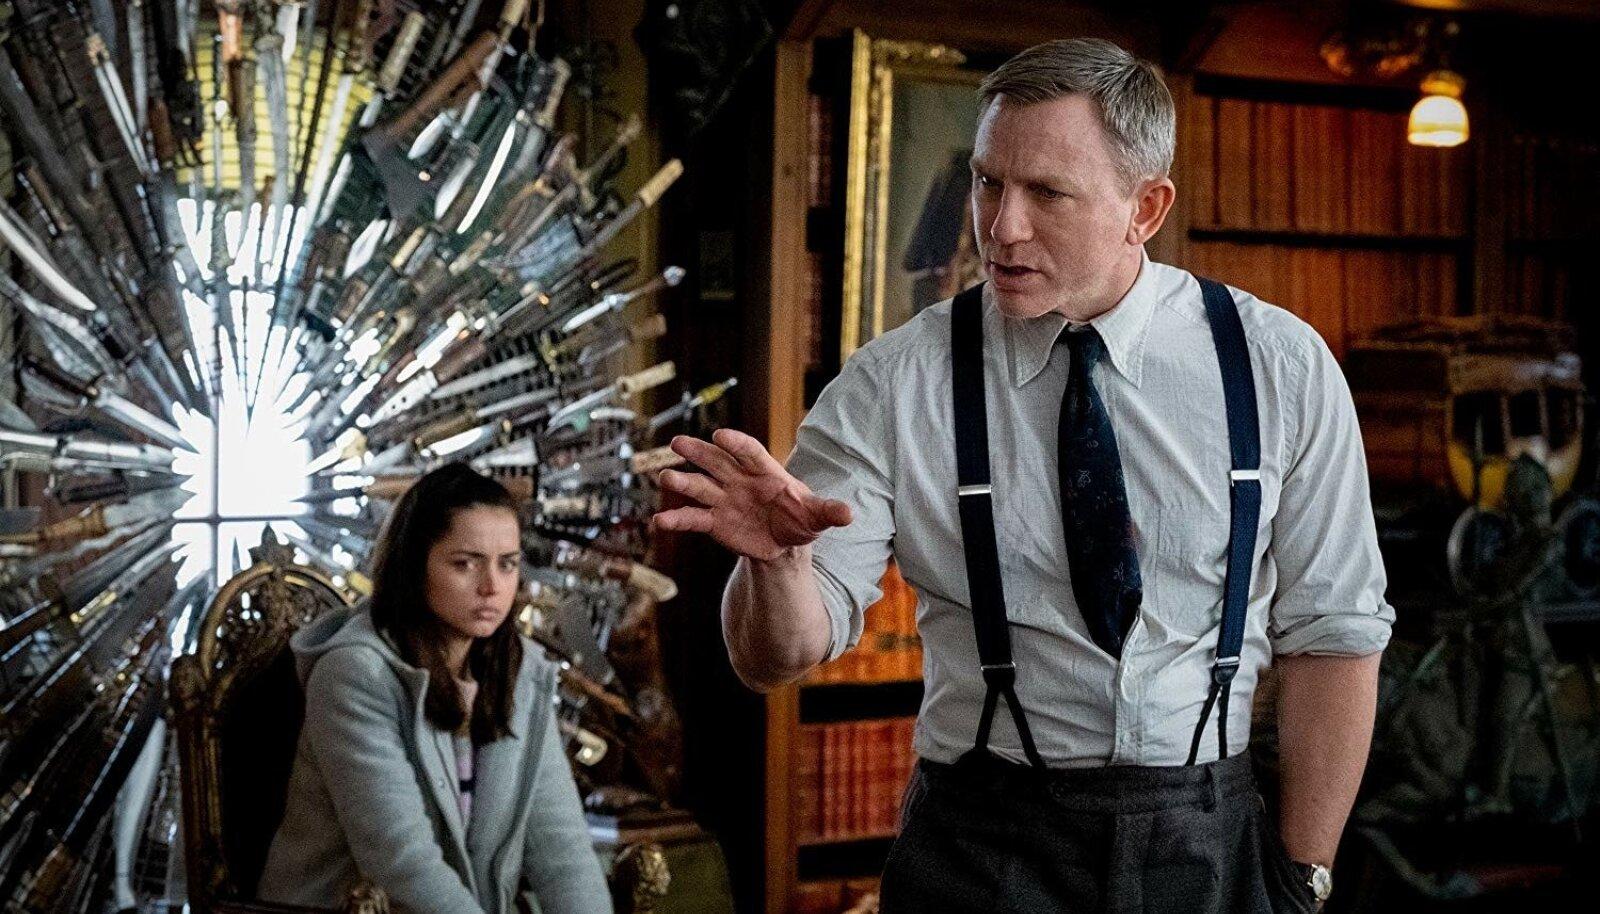 Põetaja Marta Cabrera (Ana de Armas), detektiiv Benoit Blanc (Daniel Craig) ja nugadest pühapaiste.